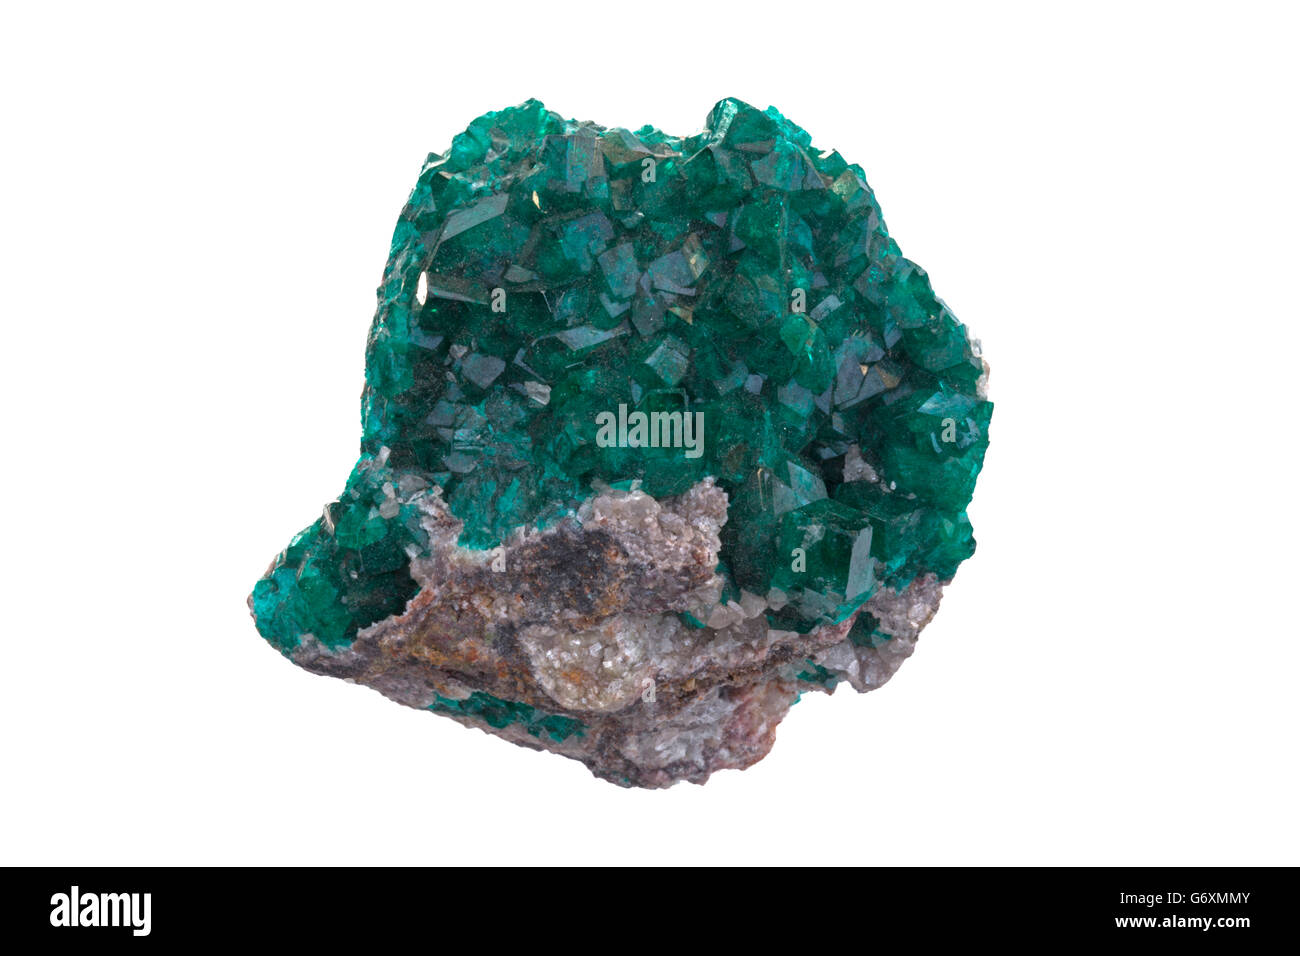 Dioptase, copper cyclosilicate mineral, Tsumeb mine, Namibia - Stock Image